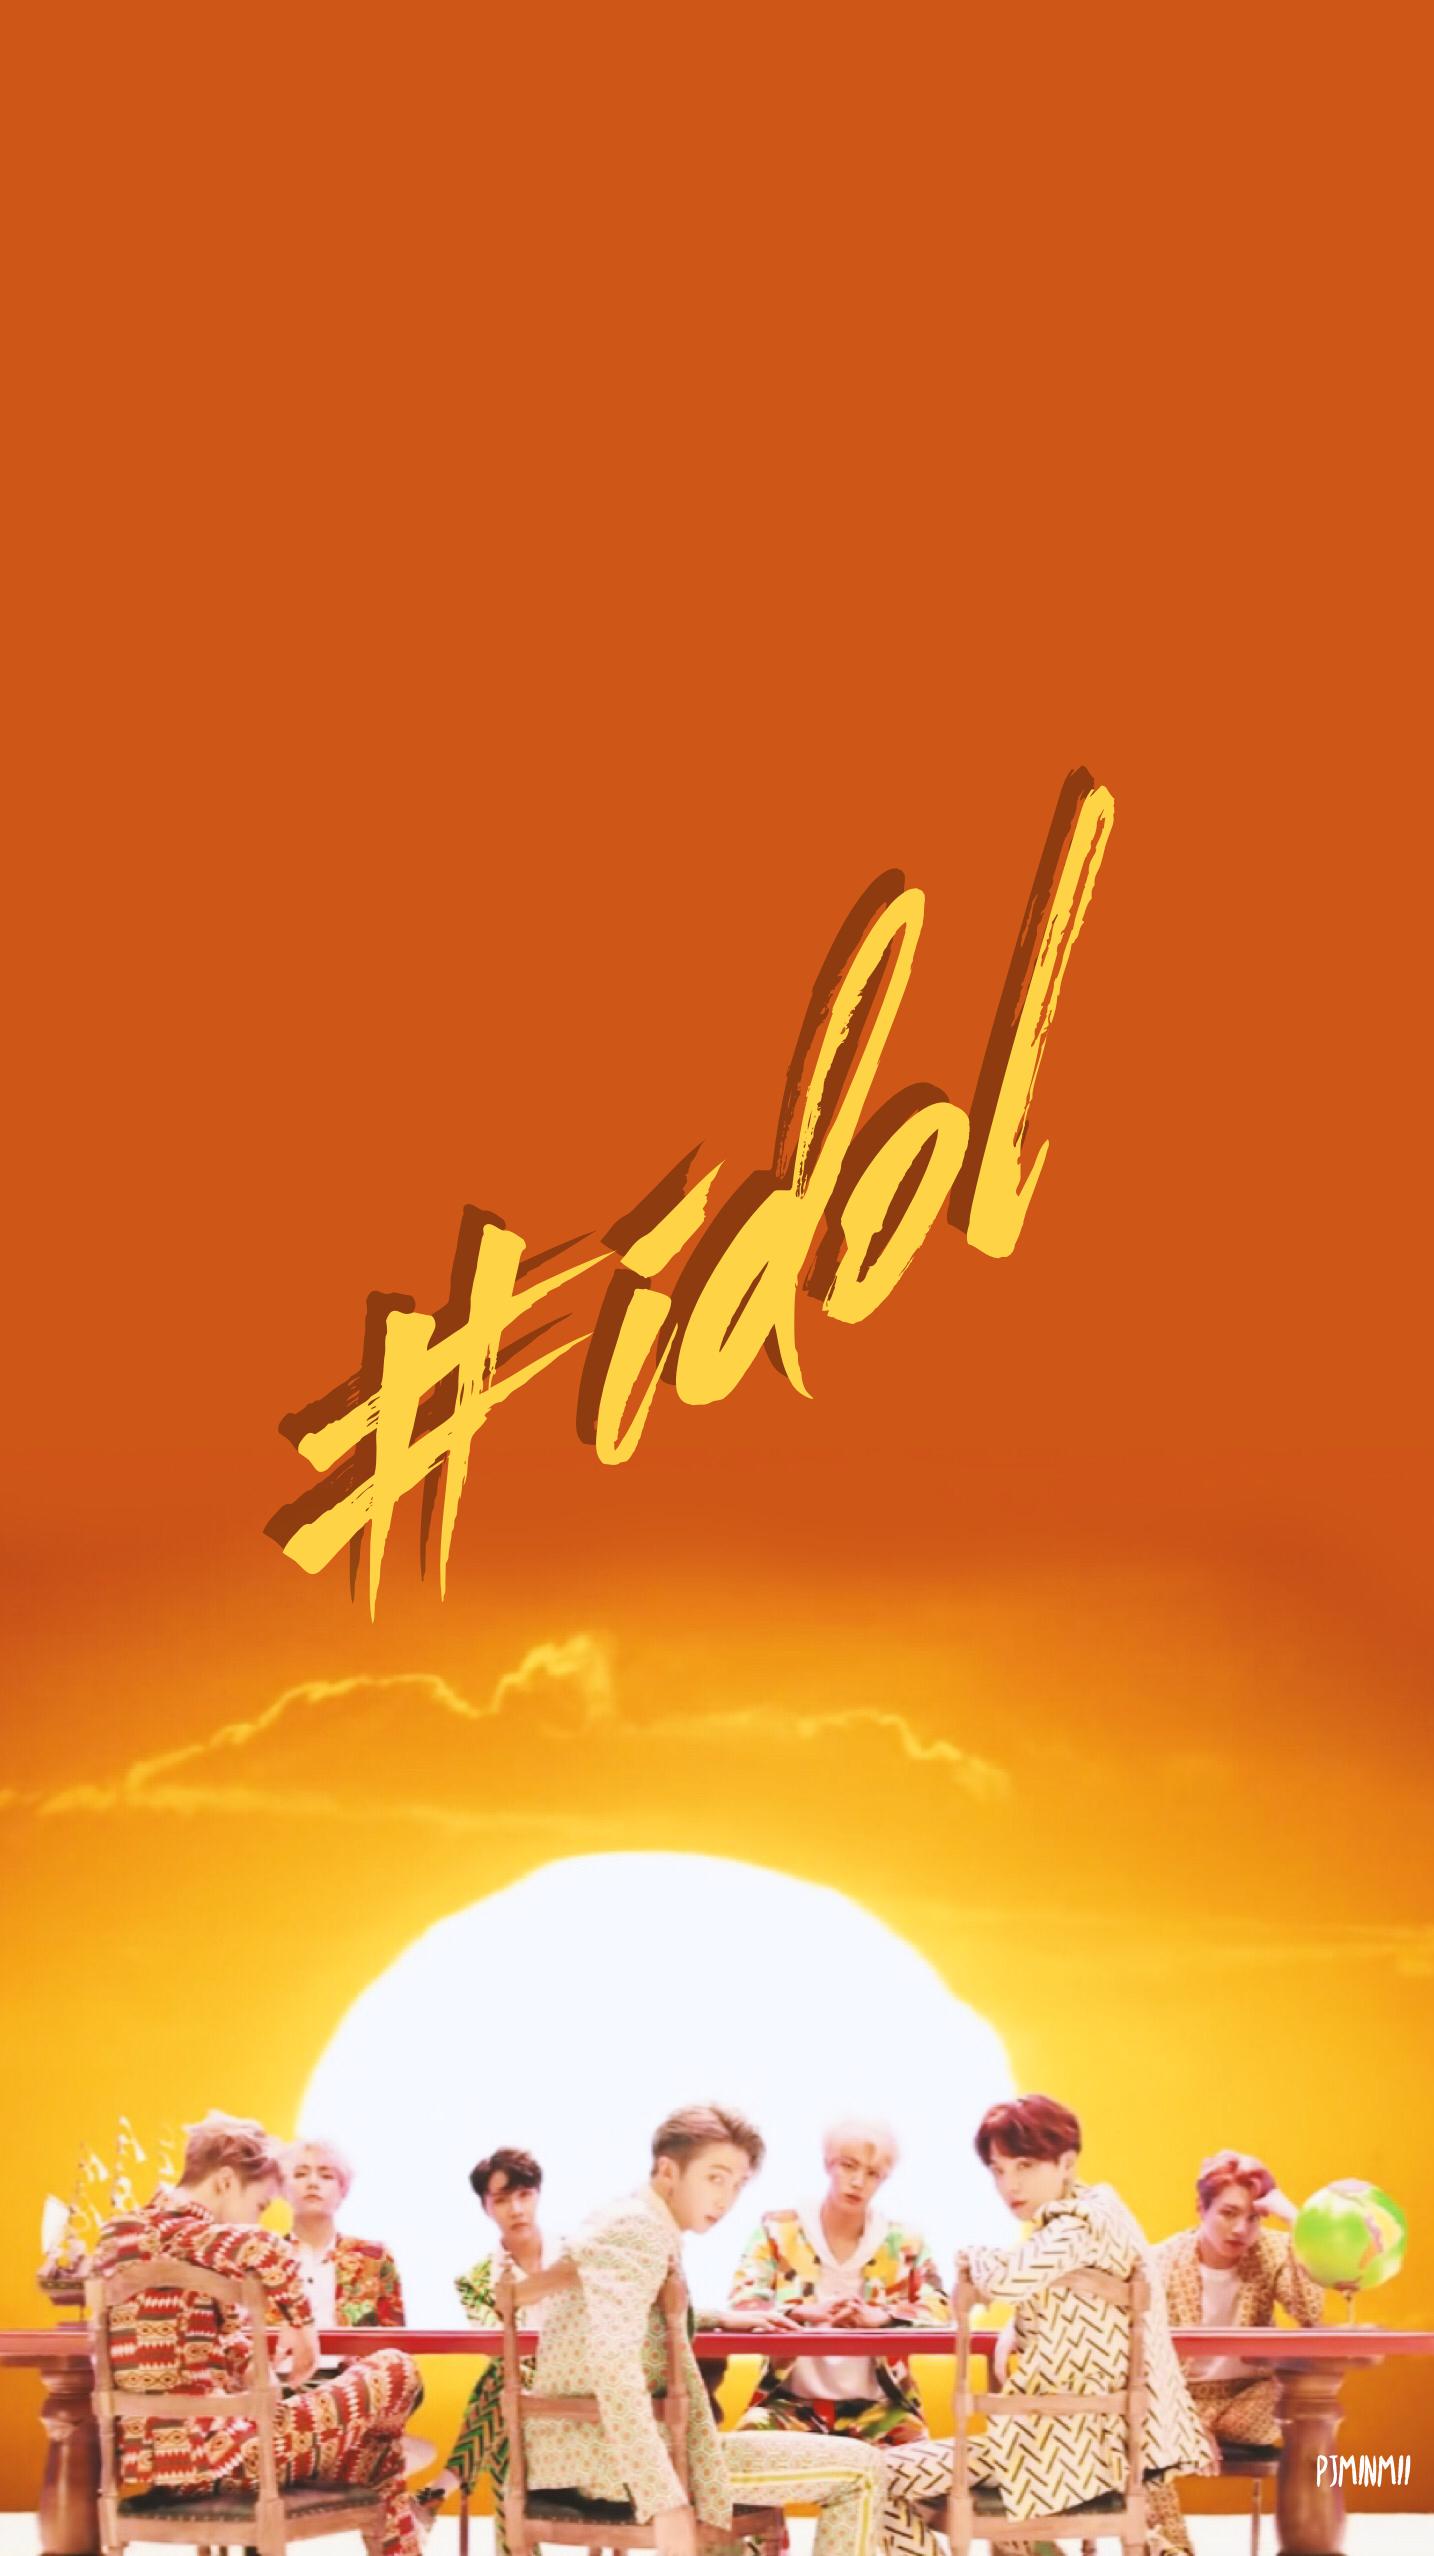 Unduh 900 Wallpaper Bts Idol  Gratis